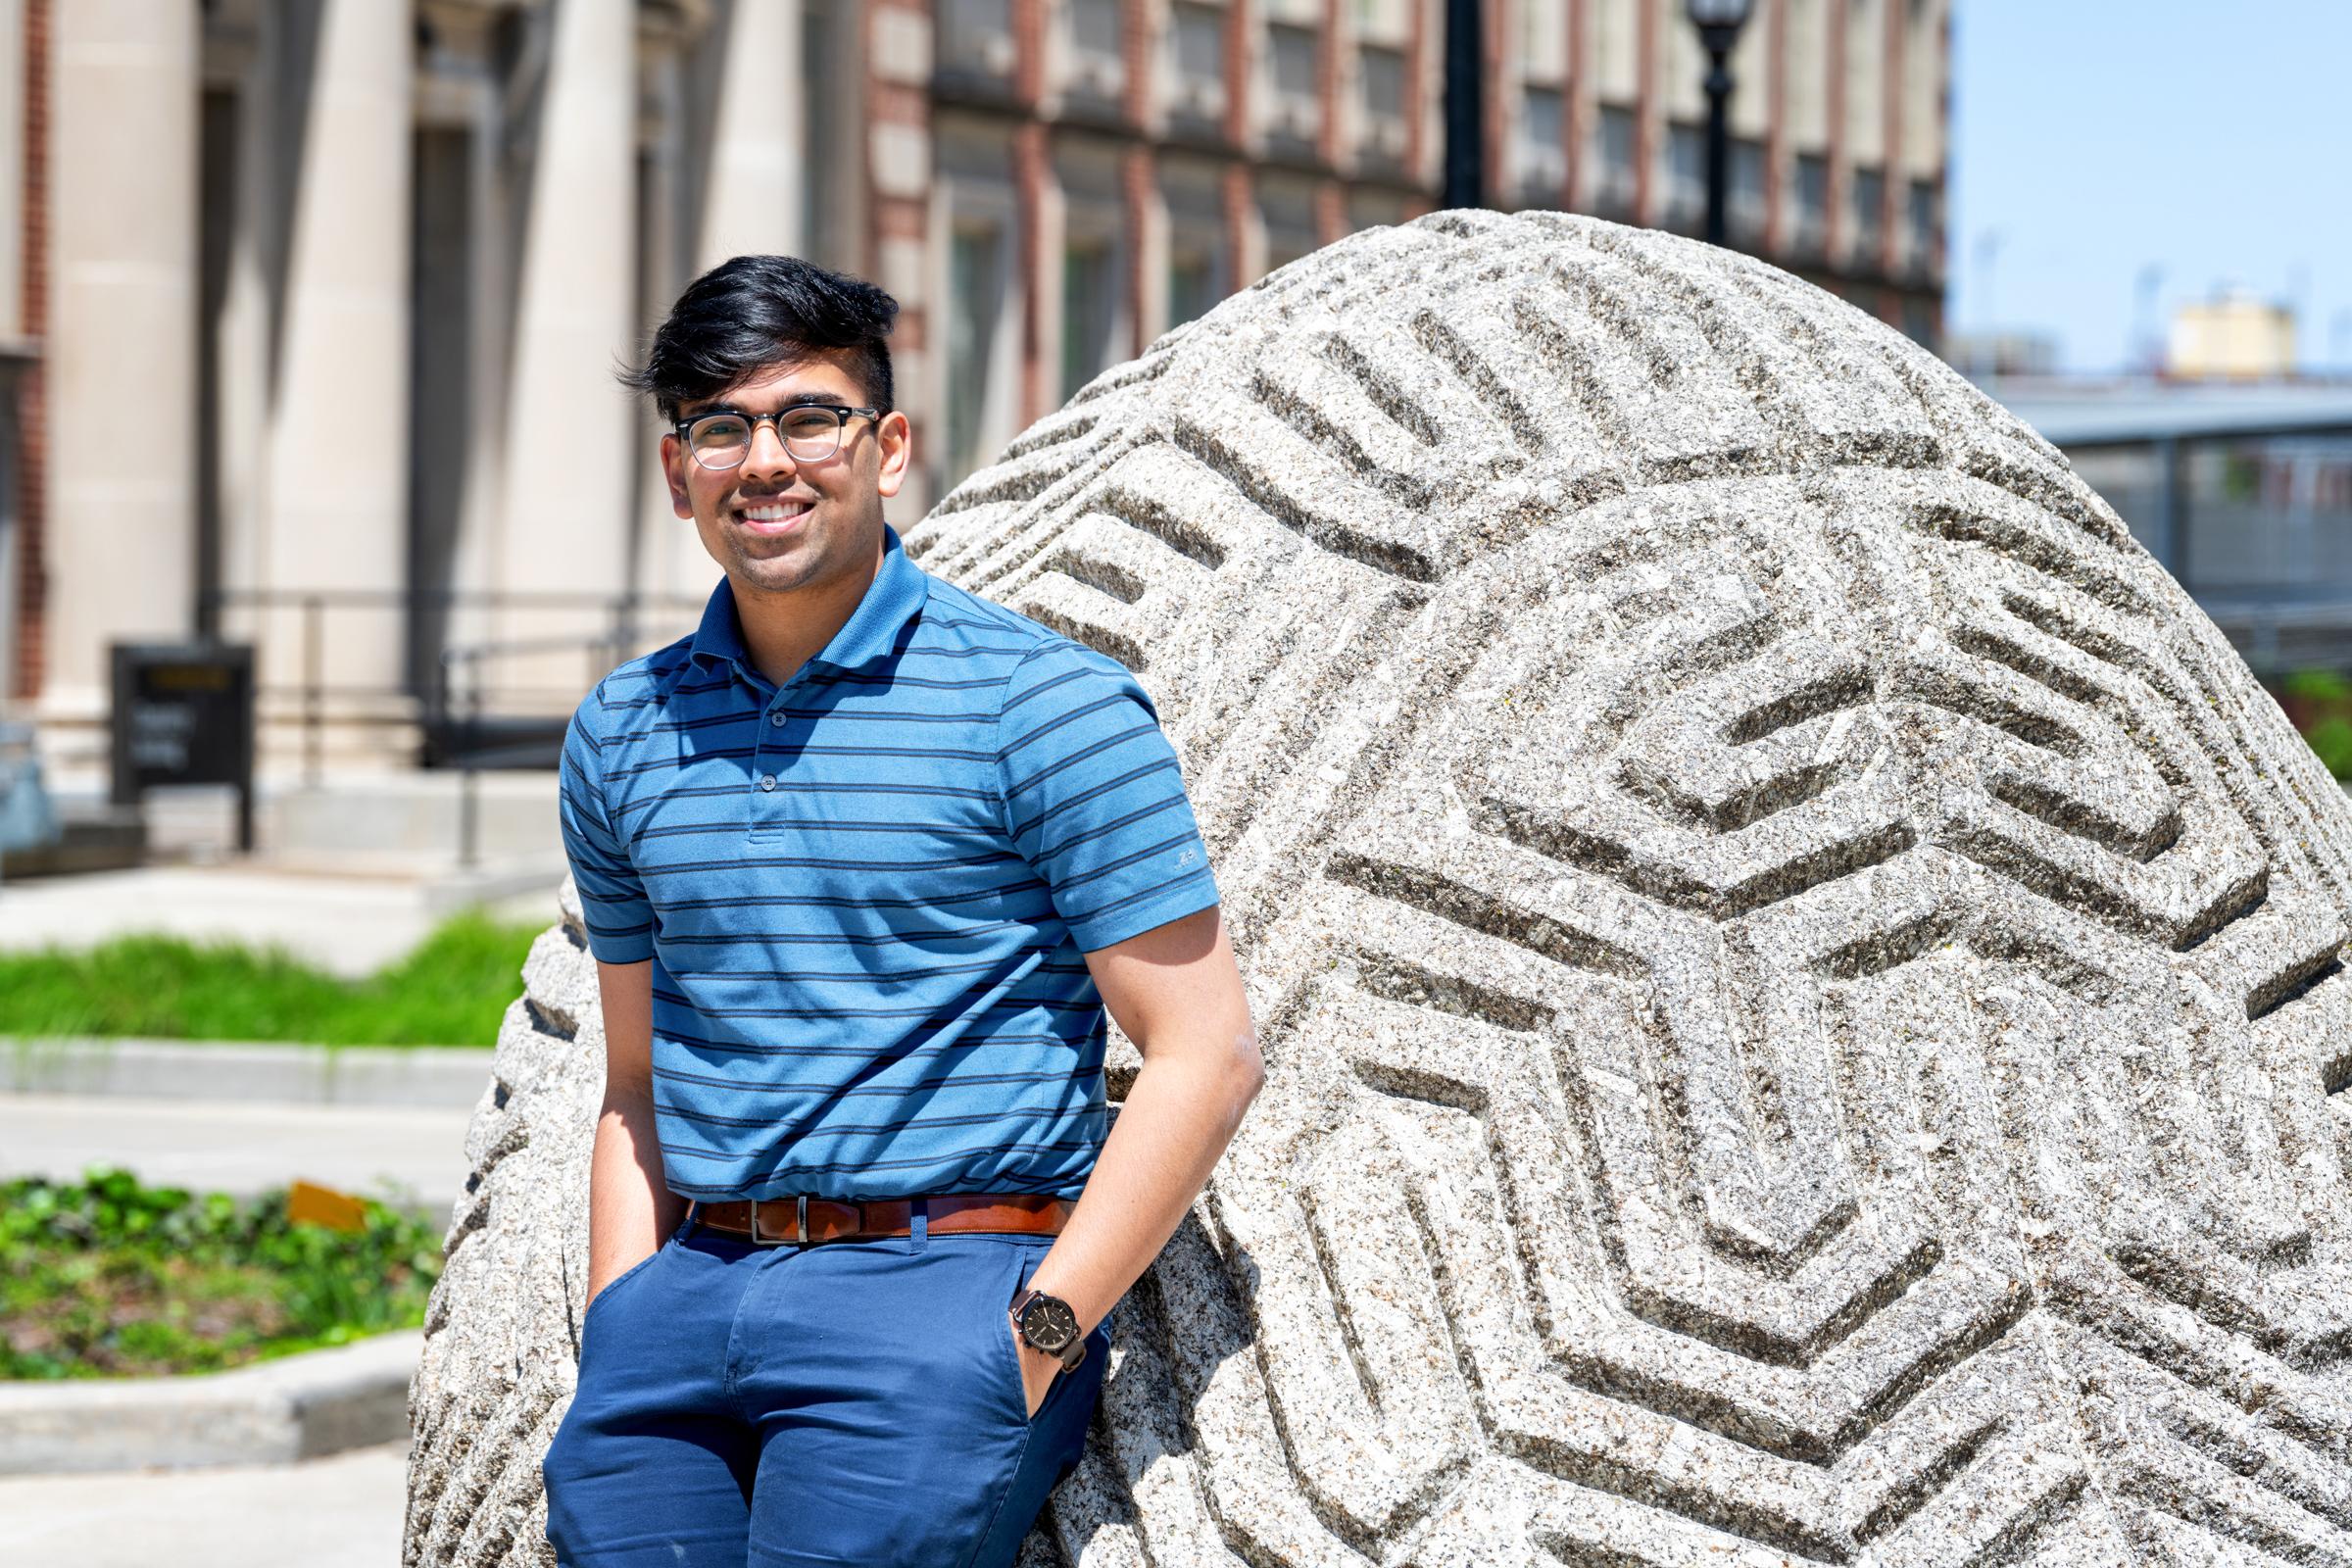 University of Iowa student Suraj Rao